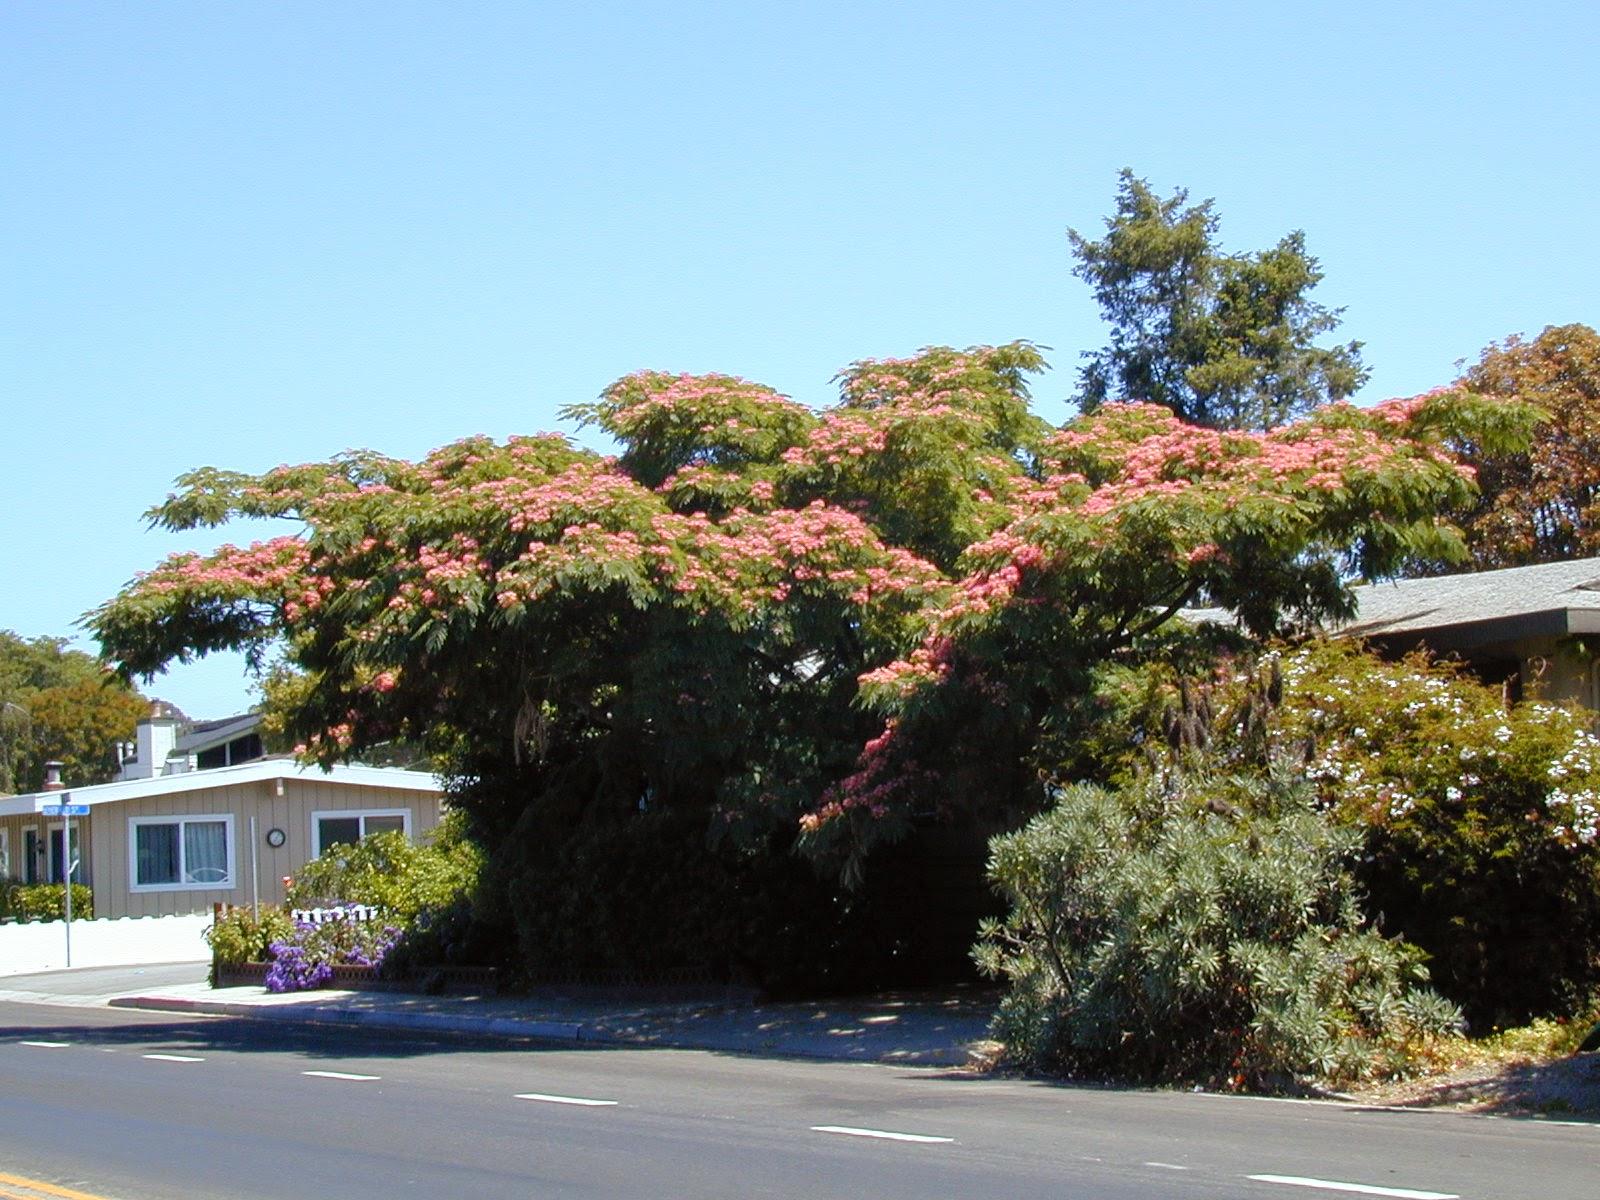 trees of santa cruz county albizia julibrissin silk tree. Black Bedroom Furniture Sets. Home Design Ideas